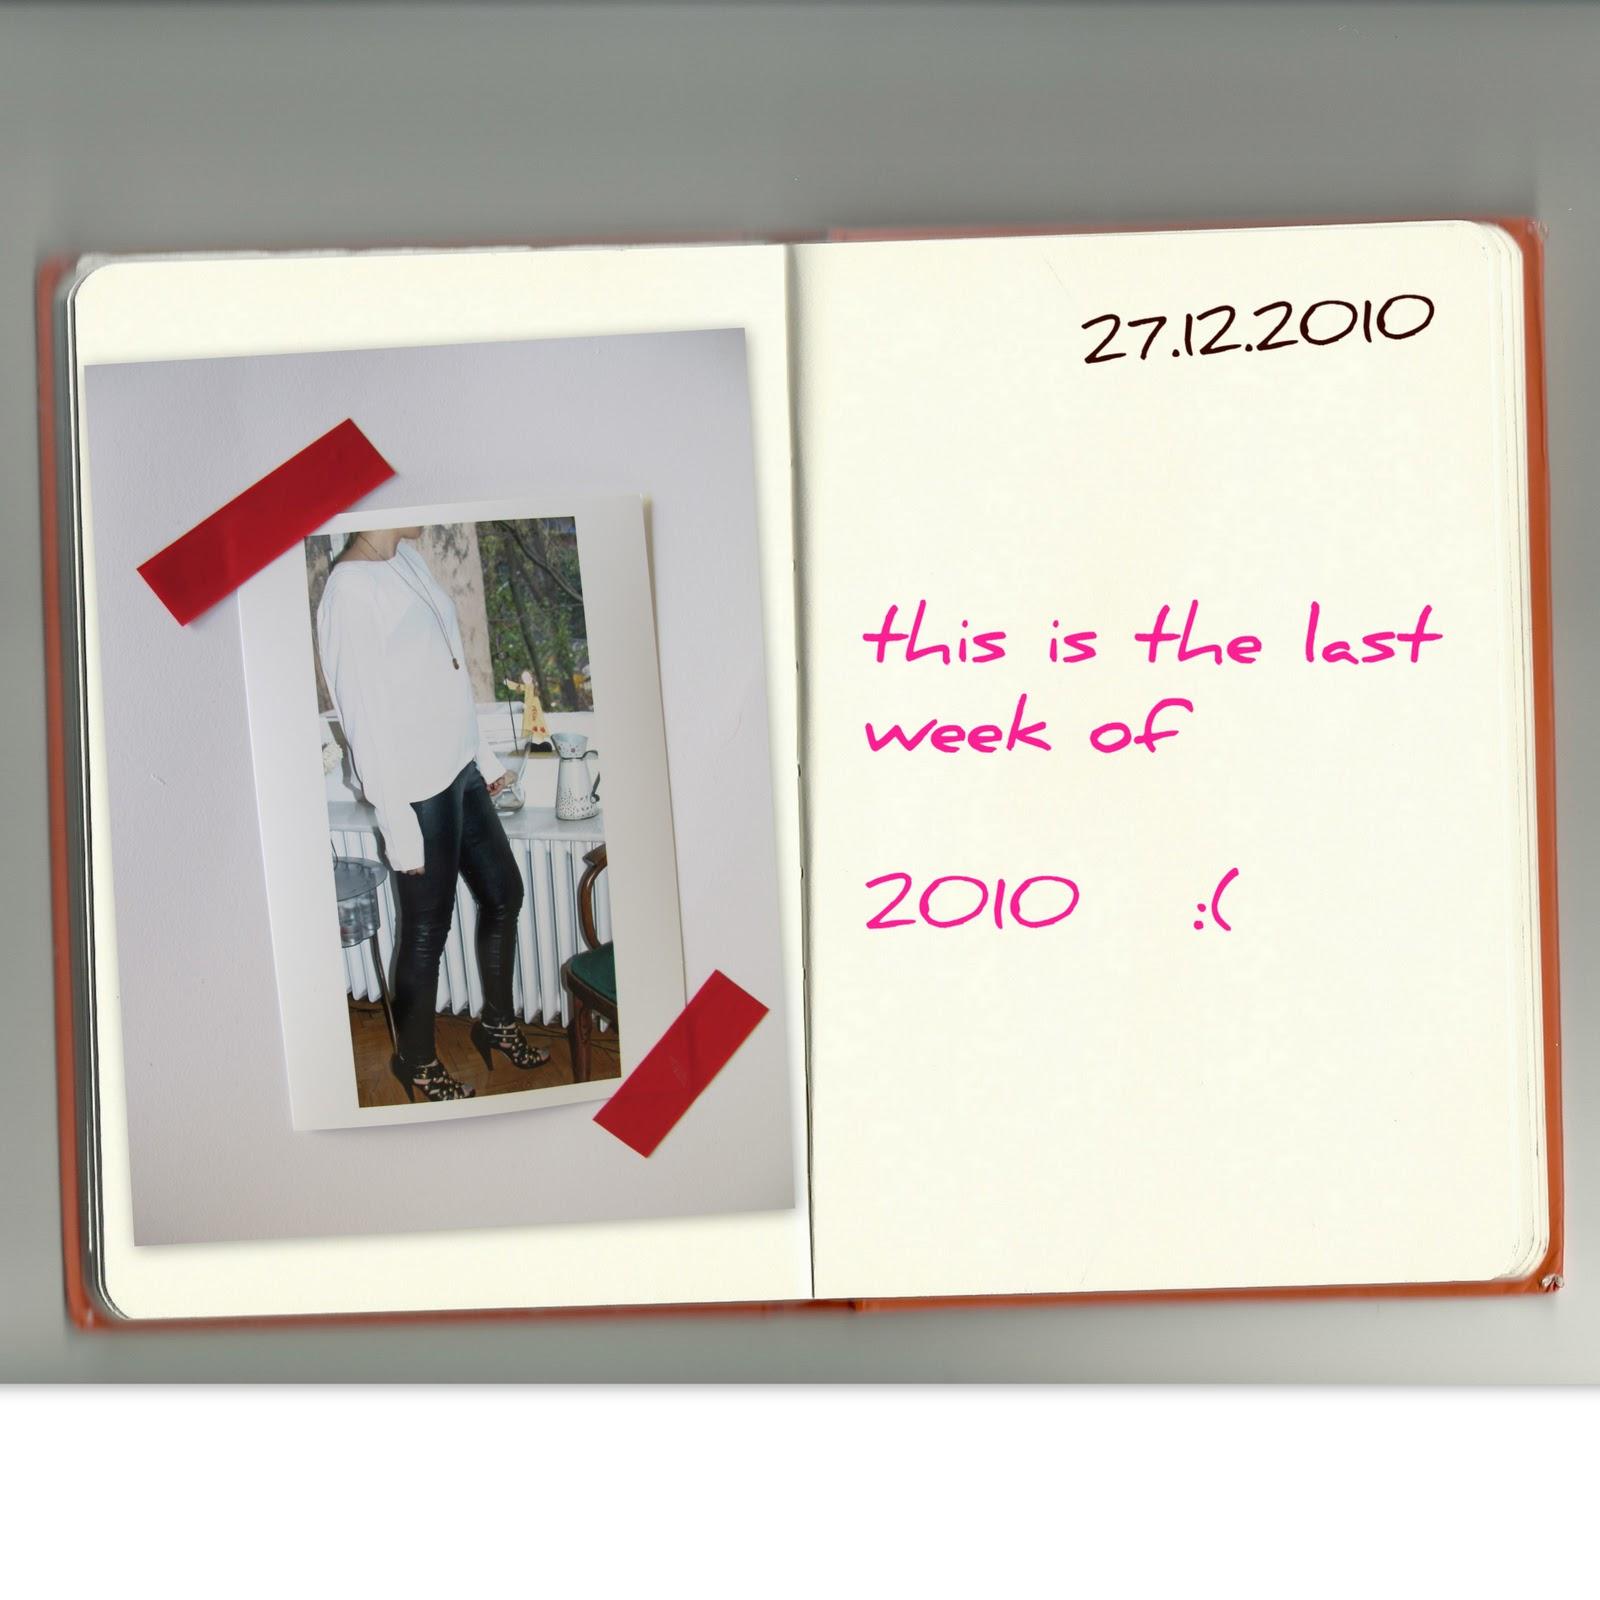 http://1.bp.blogspot.com/_zXZ686sPDZE/TRiHZ0VKSGI/AAAAAAAAKYc/v5mLv8IzdLQ/s1600/27.12.2010.jpg